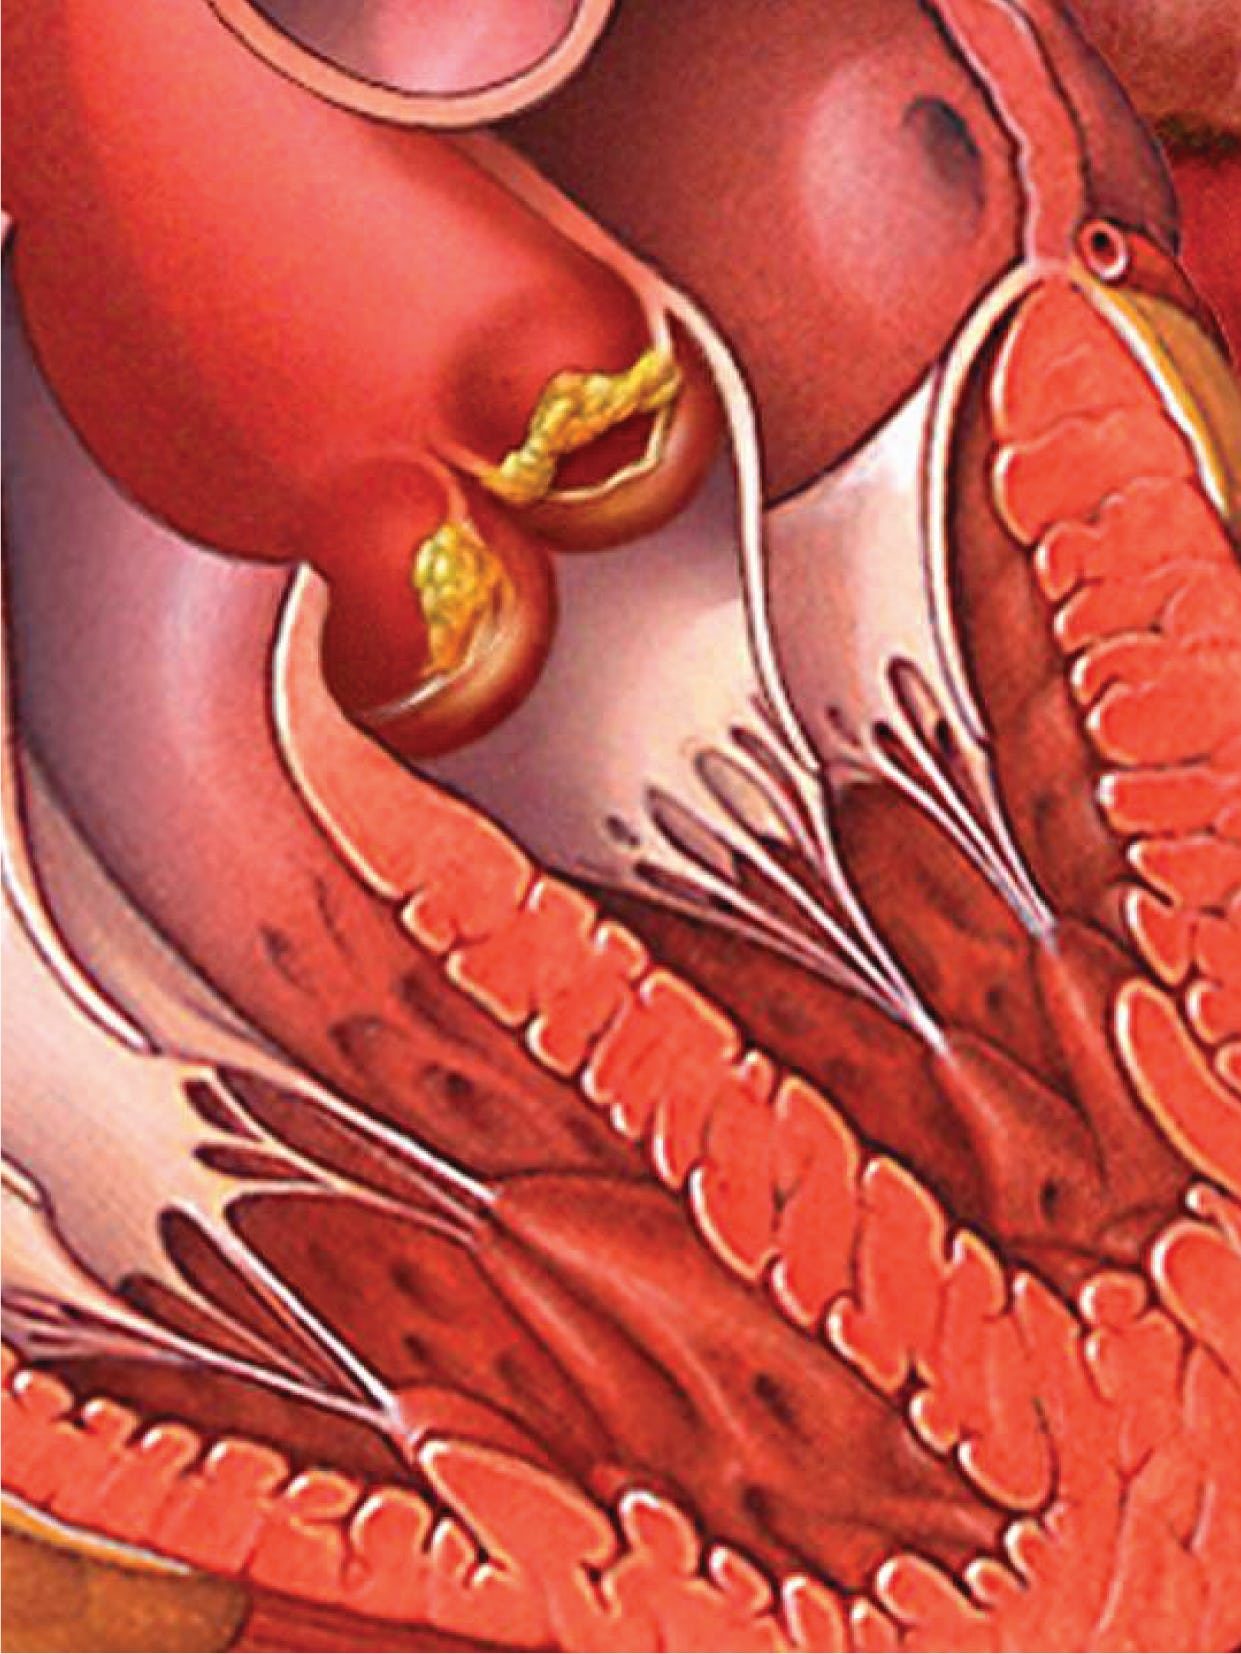 Endocardita - cauze, simptome, tratament